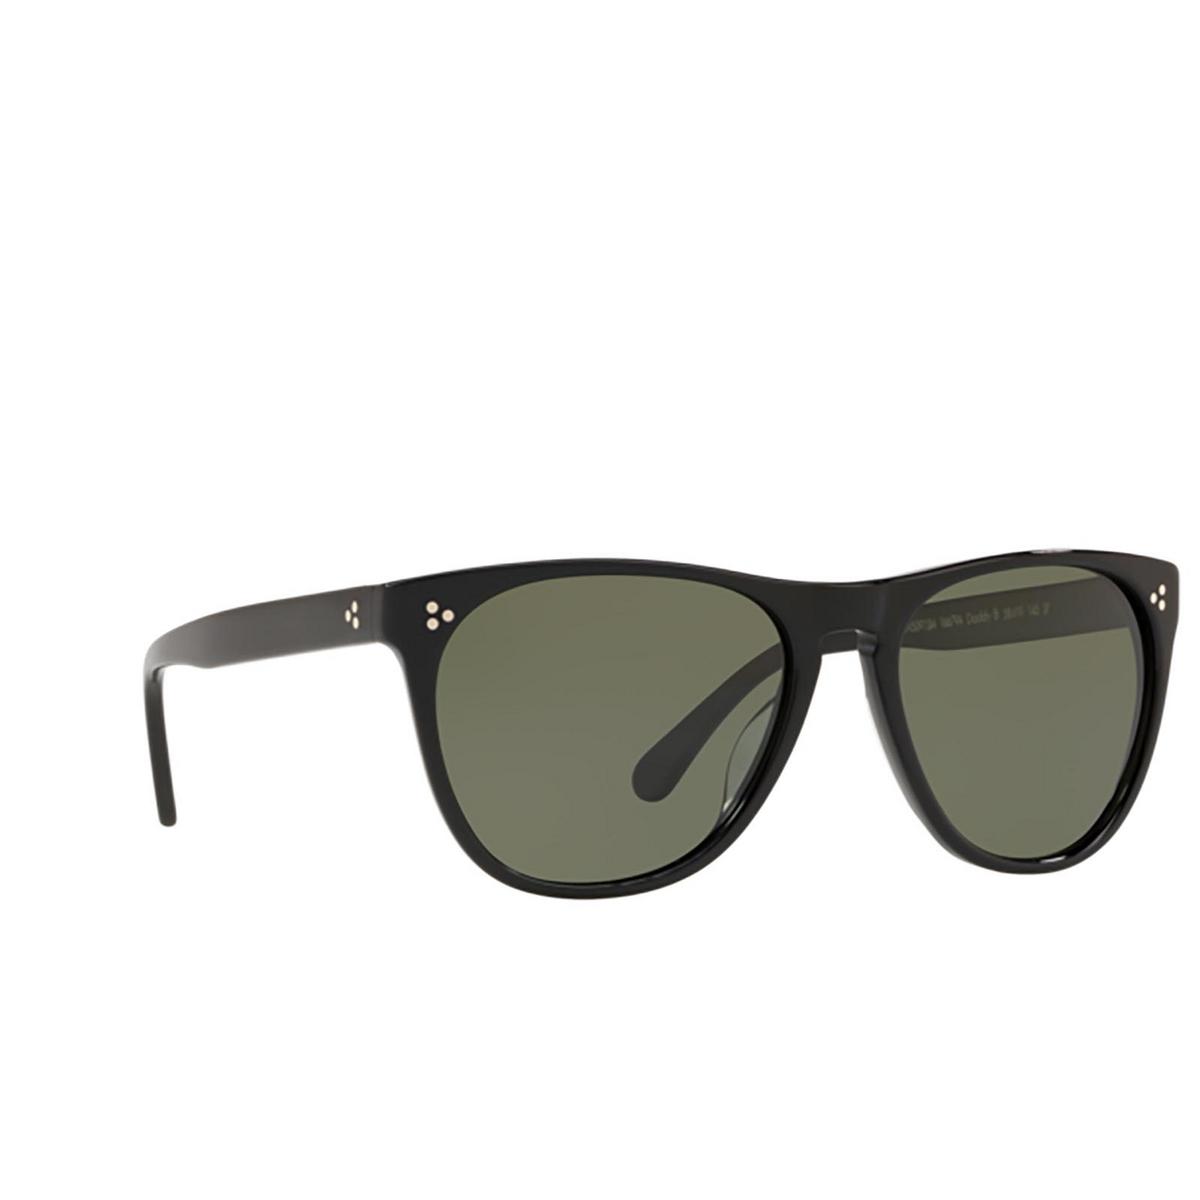 Oliver Peoples® Square Sunglasses: Daddy B. OV5091SM color Black 16679A.